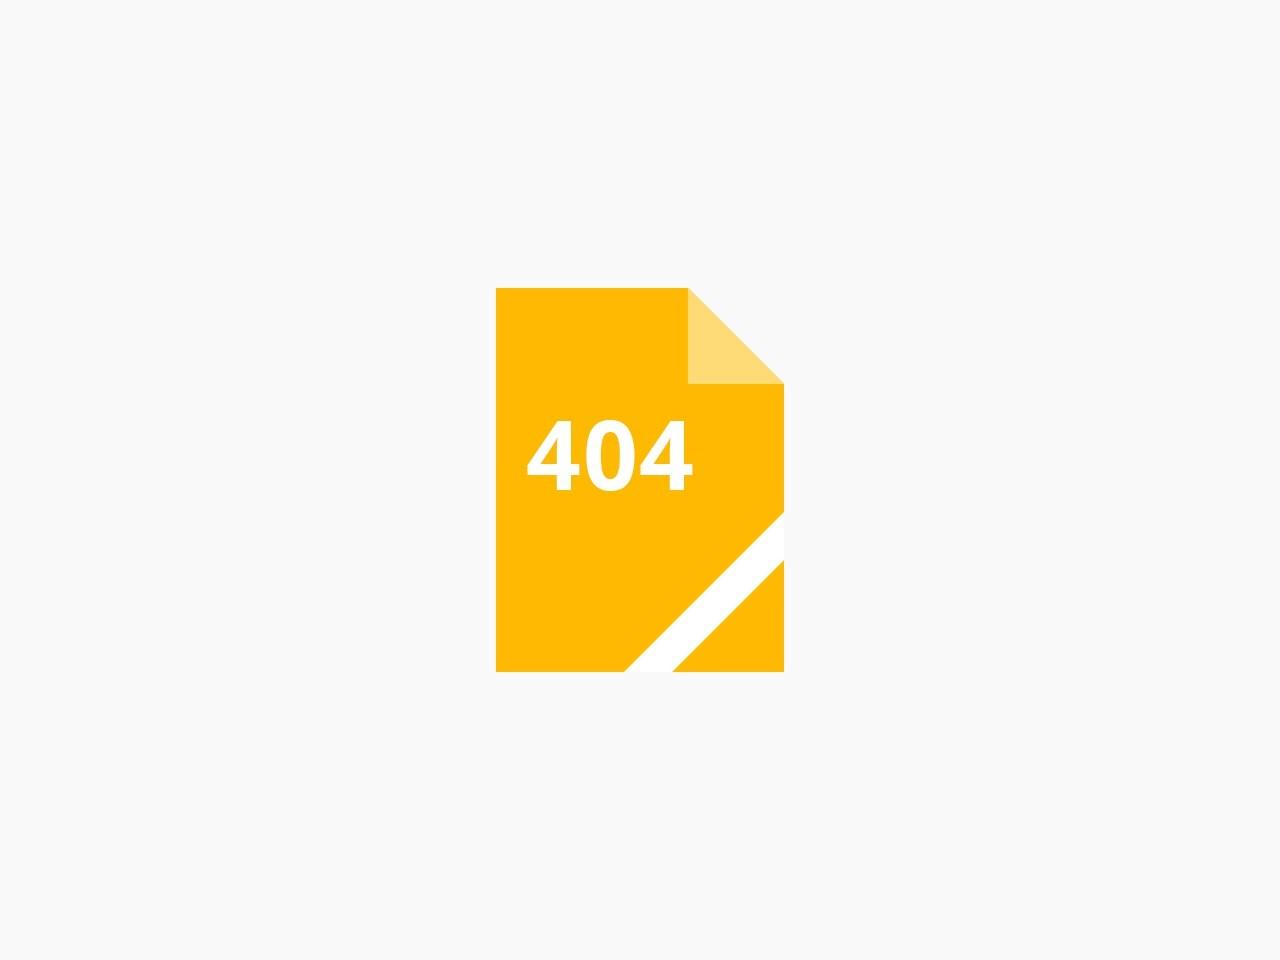 http://www.vindale.com/